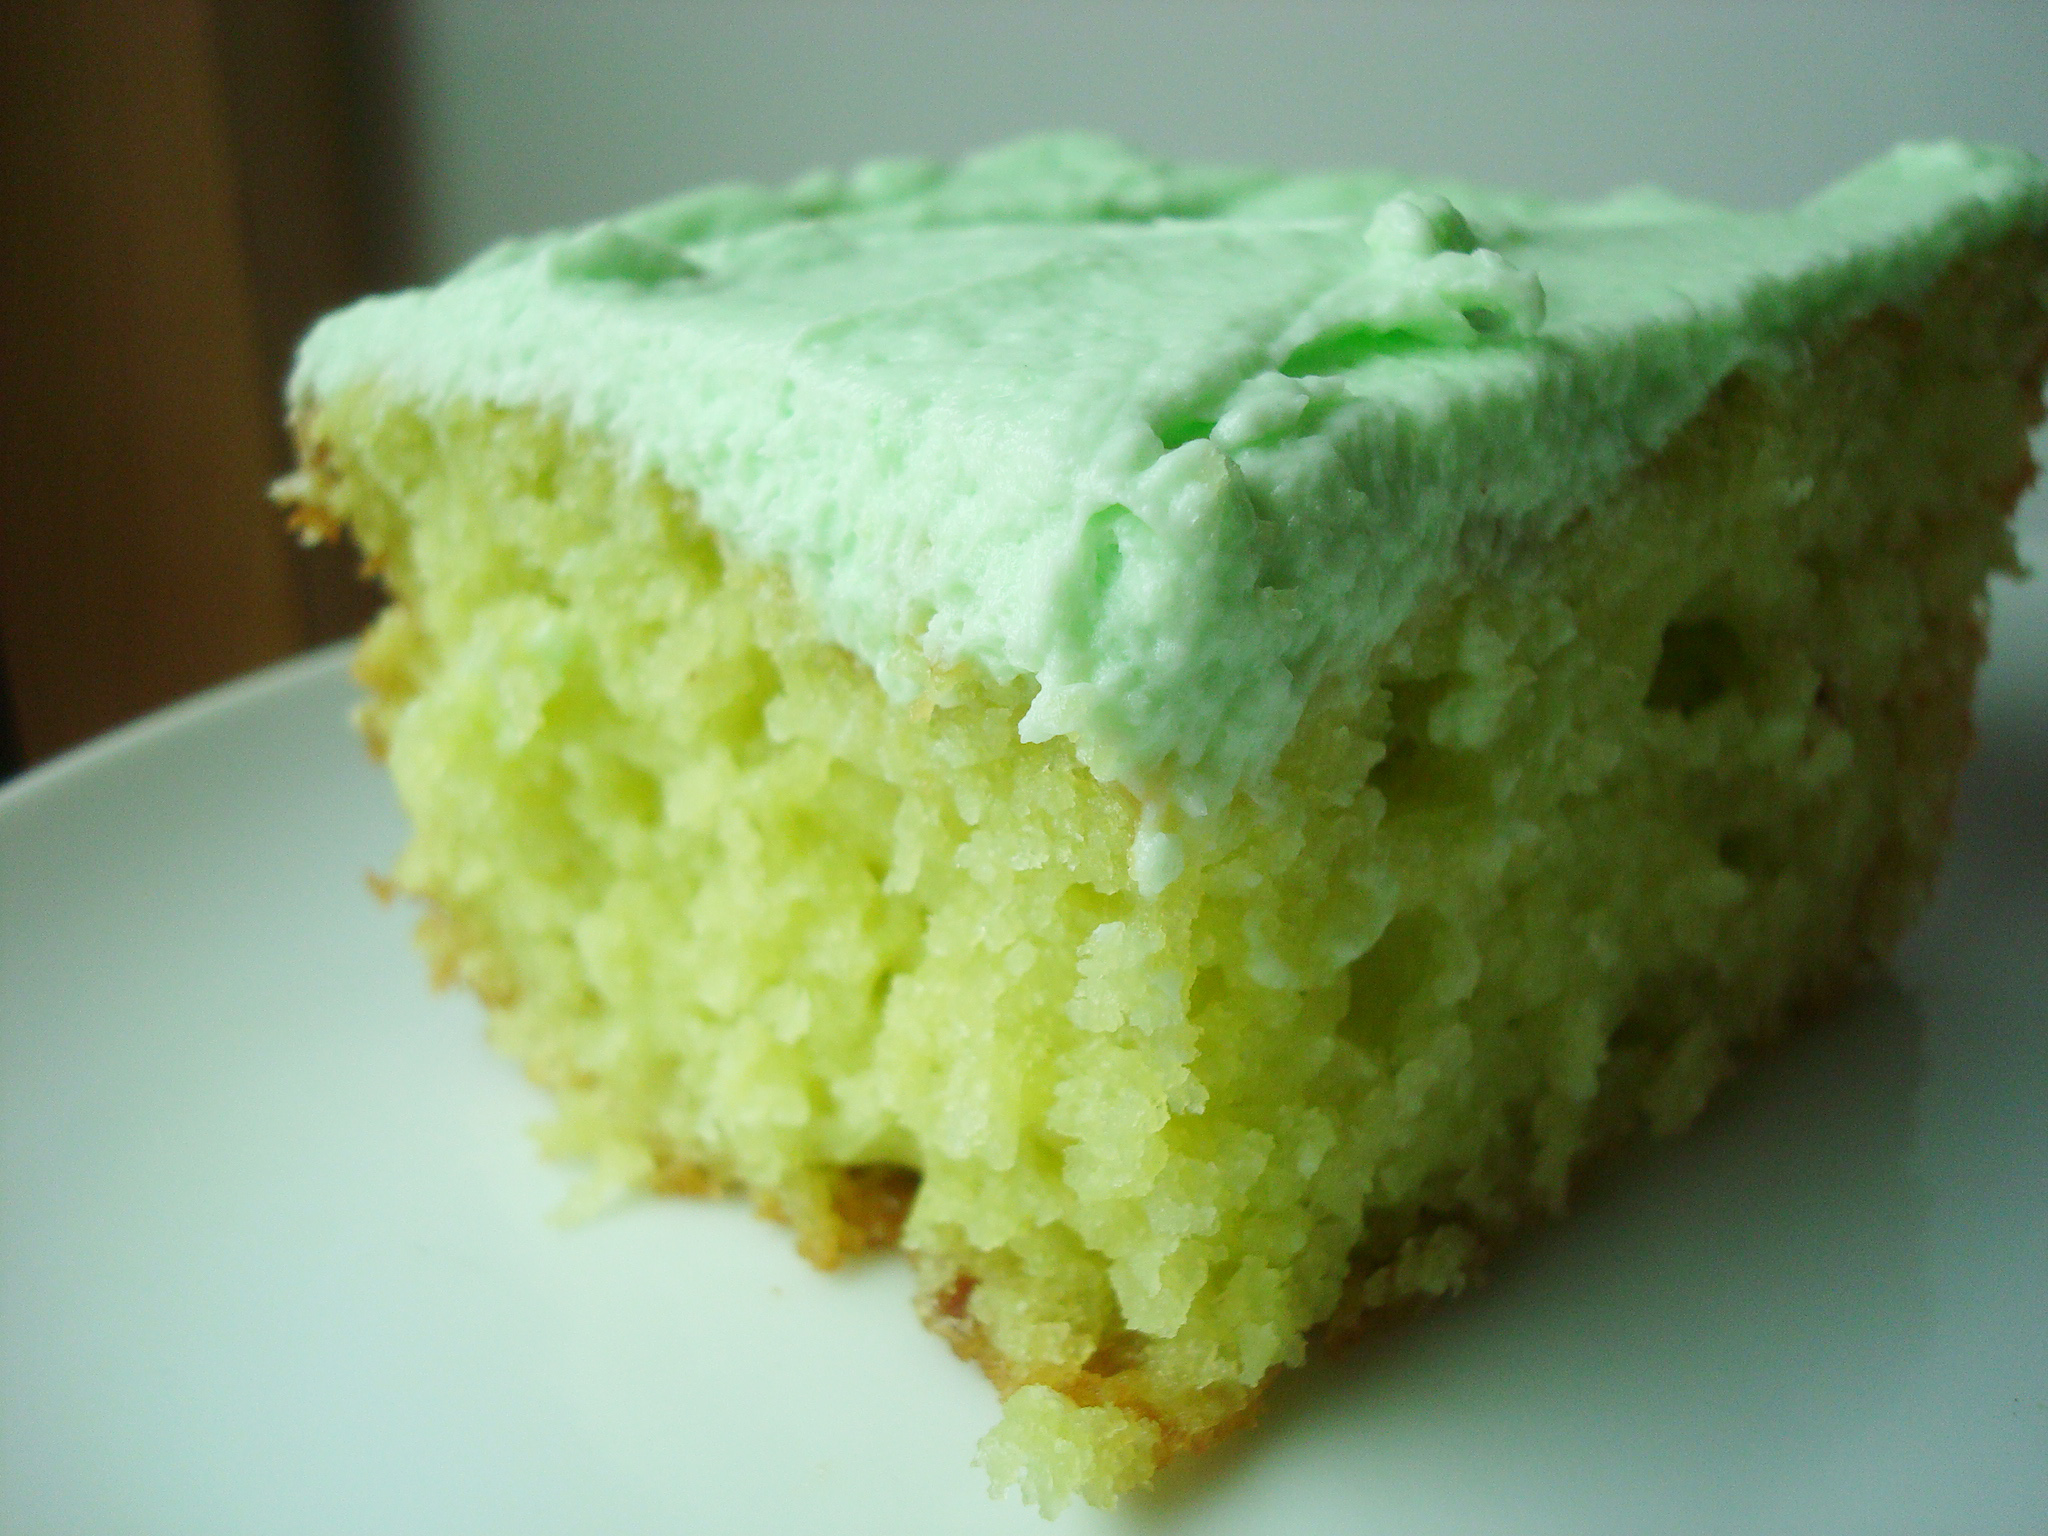 Pudding mix cake